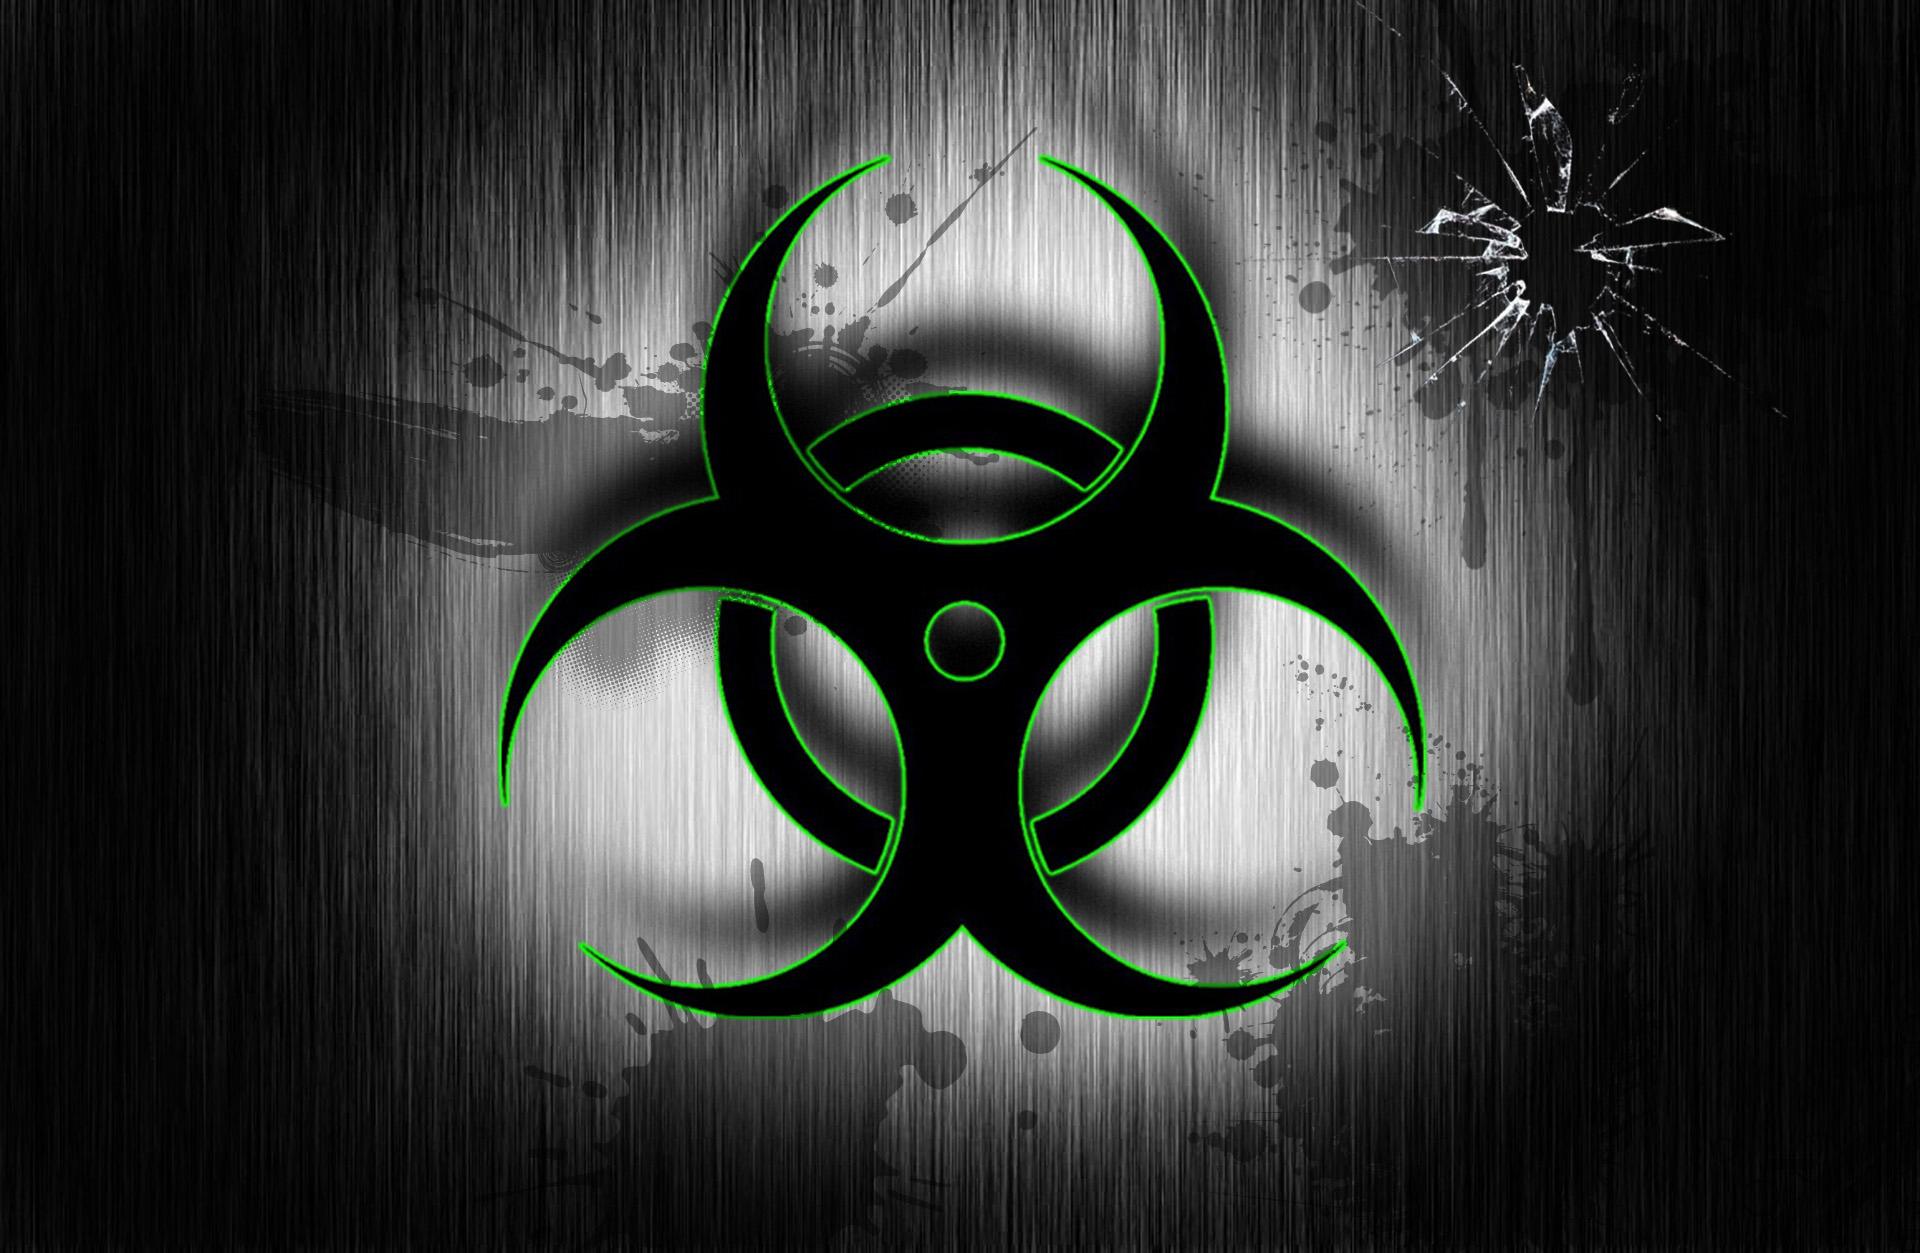 biohazard wallpaper by azula bluefire on deviantart